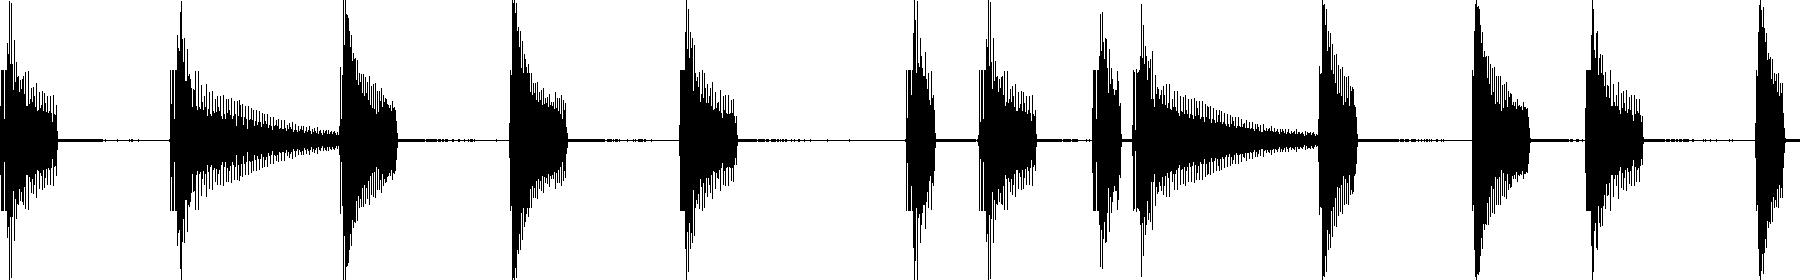 ehp synloop 127 electricblue f